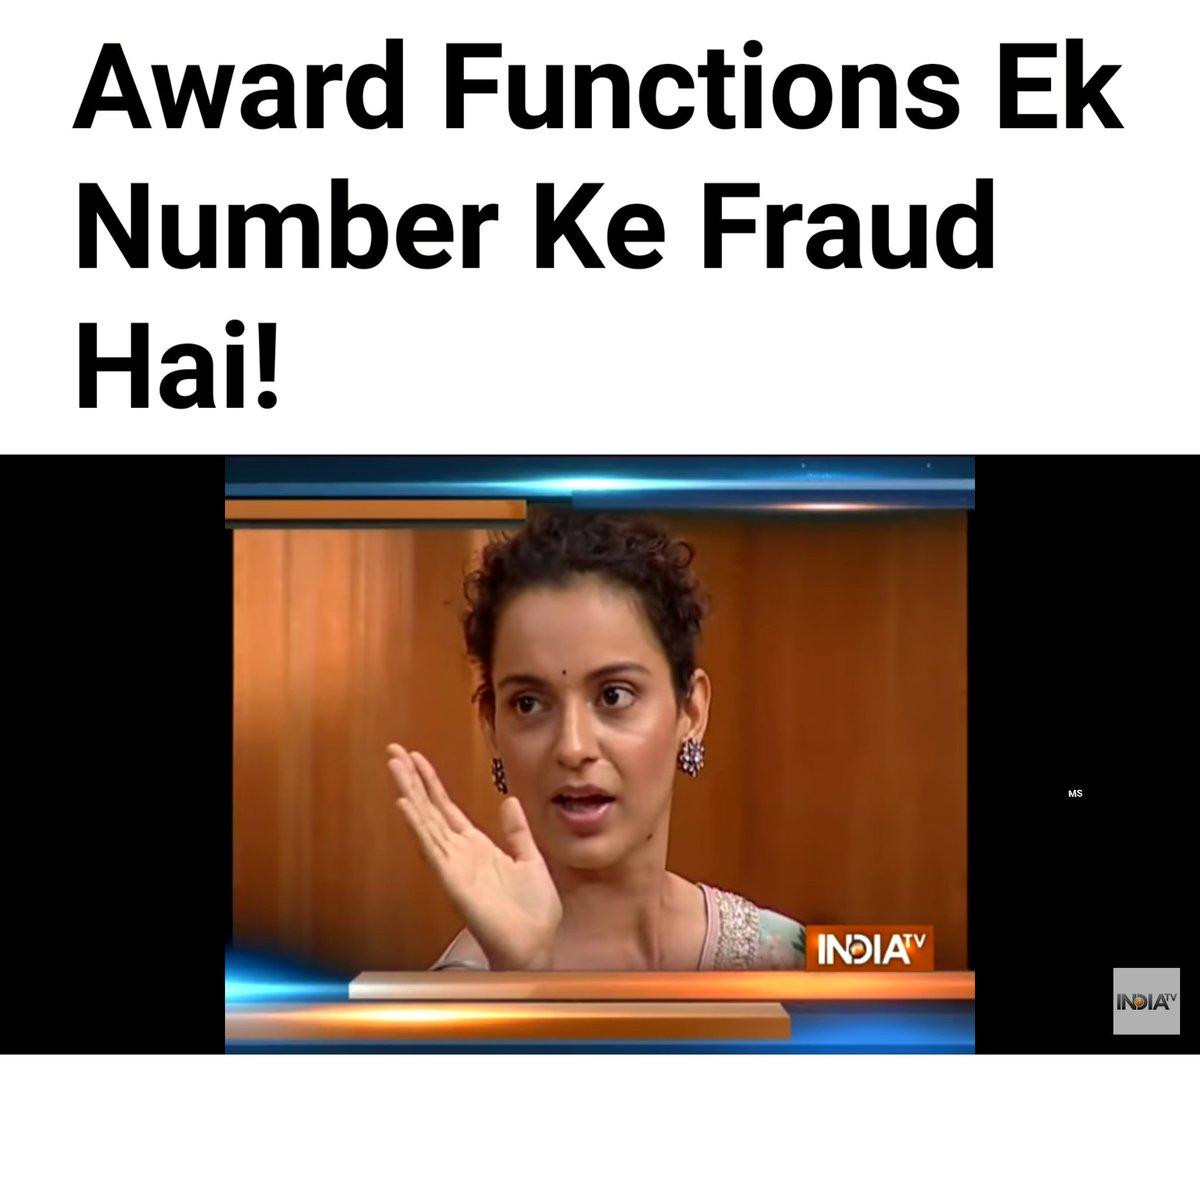 Filmfare Summary in one line! #BoycottFilmFare  #BoycottFilmfareAwards #FilmfareAwards2020  #FilmfareAward2020  #AmazonFilmfareAwards  #Filmfare  #Bollywood  #KangnaRanaut <br>http://pic.twitter.com/RMfyDBC7Bj